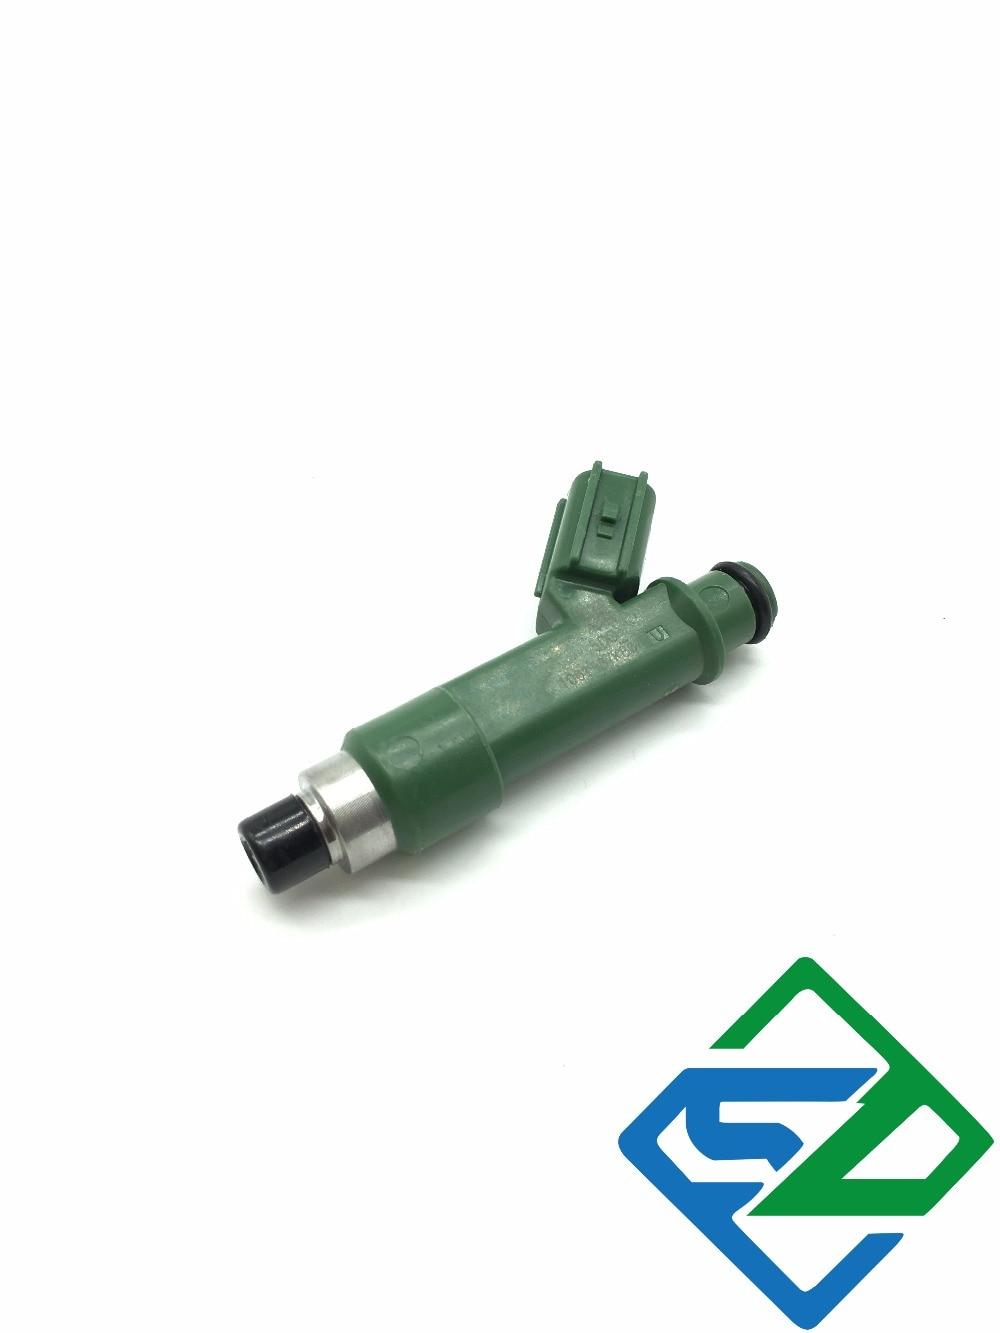 Cheap Fuel Injector Nozzle For Toyota Camry Corolla Nissan 1JZGTE 2JZGTE  RB20DET 700CC OEM:1001-87K80 100187K80 1001 87K80 - MARIASHOP GA